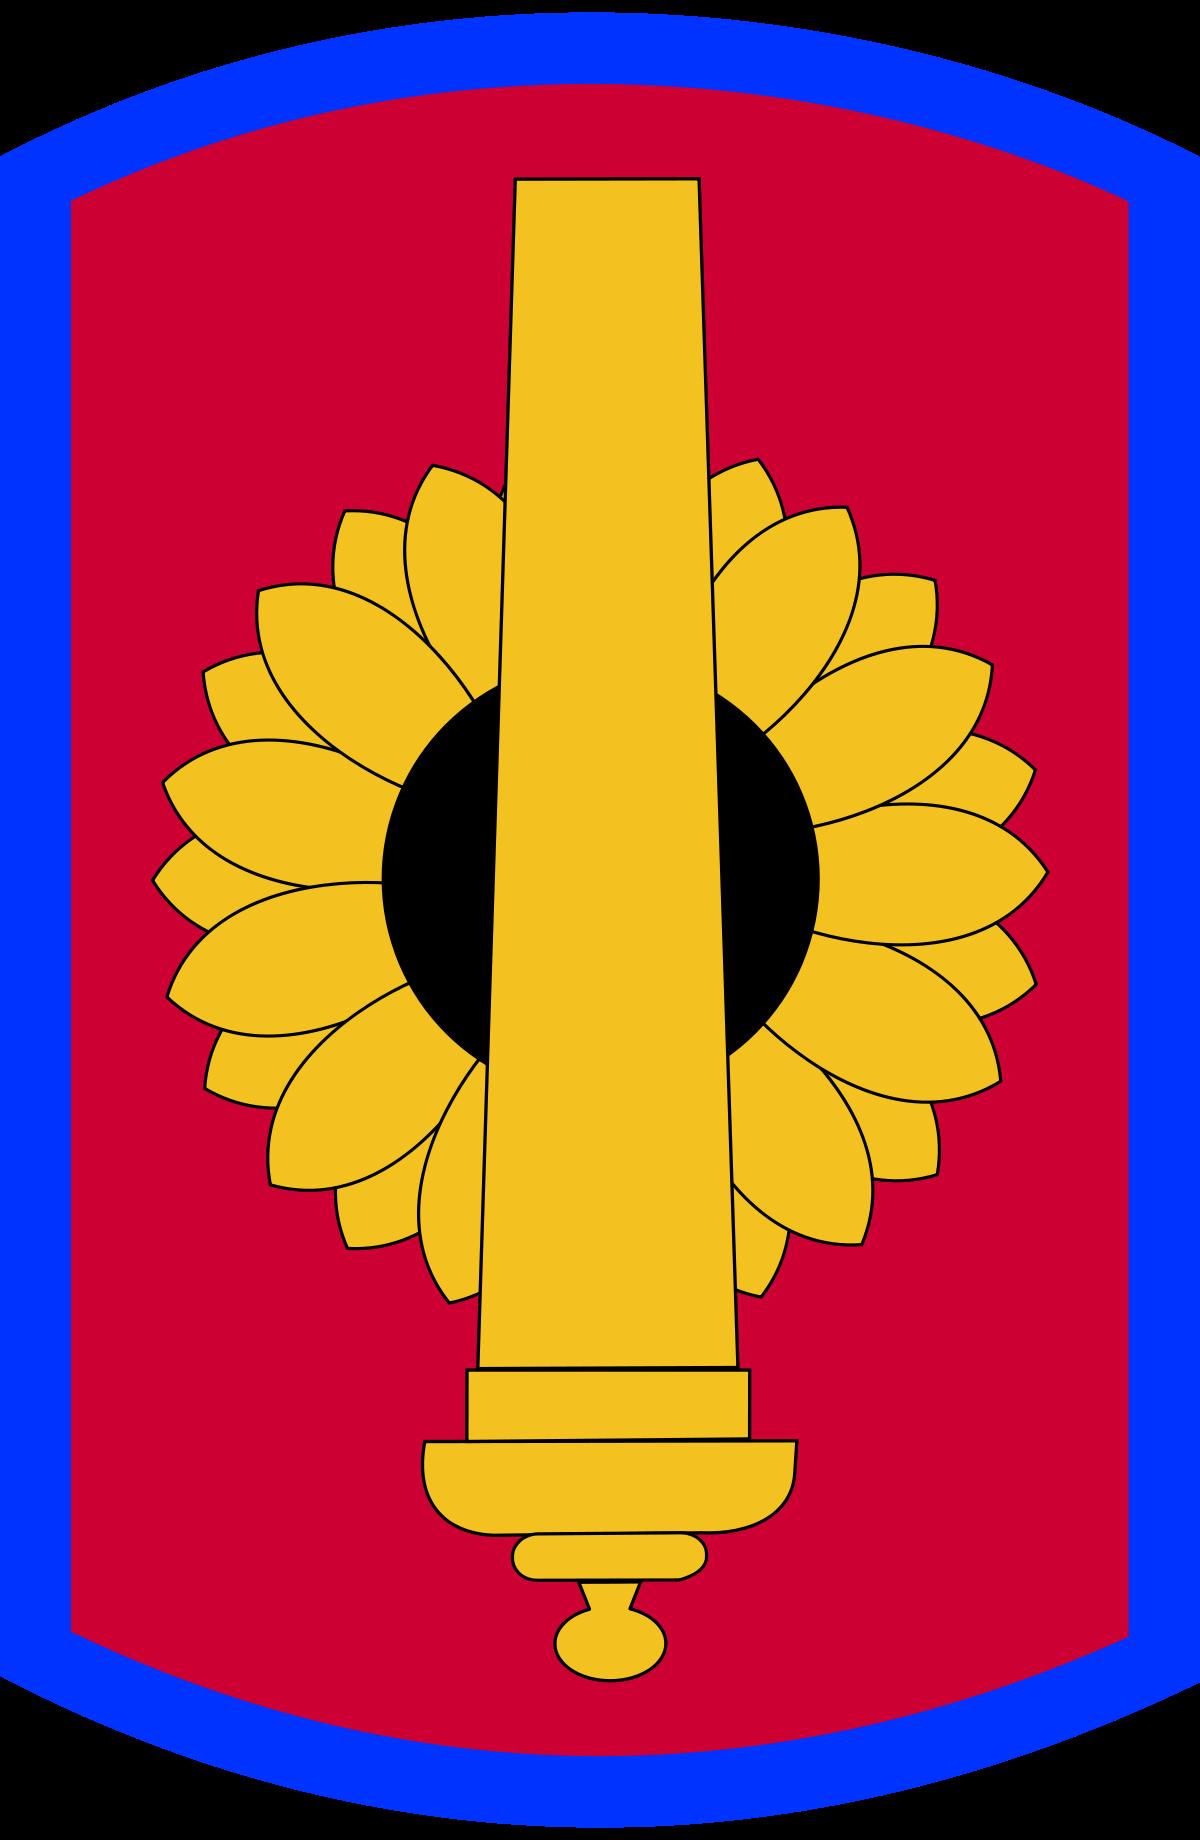 130th Field Artillery Brigade Wikipedia